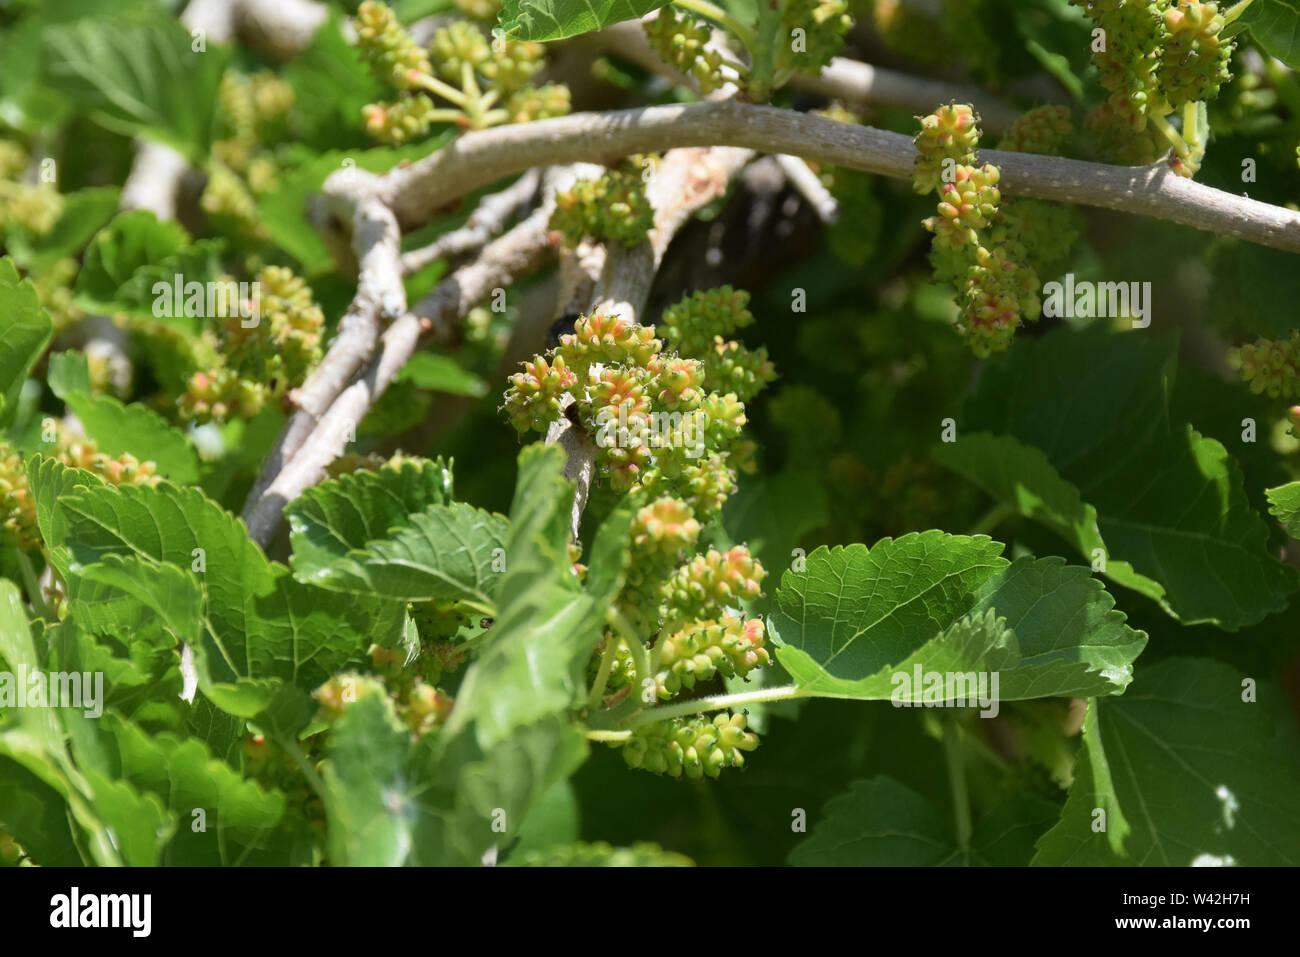 Samarkand grape tree in bloom - Stock Image